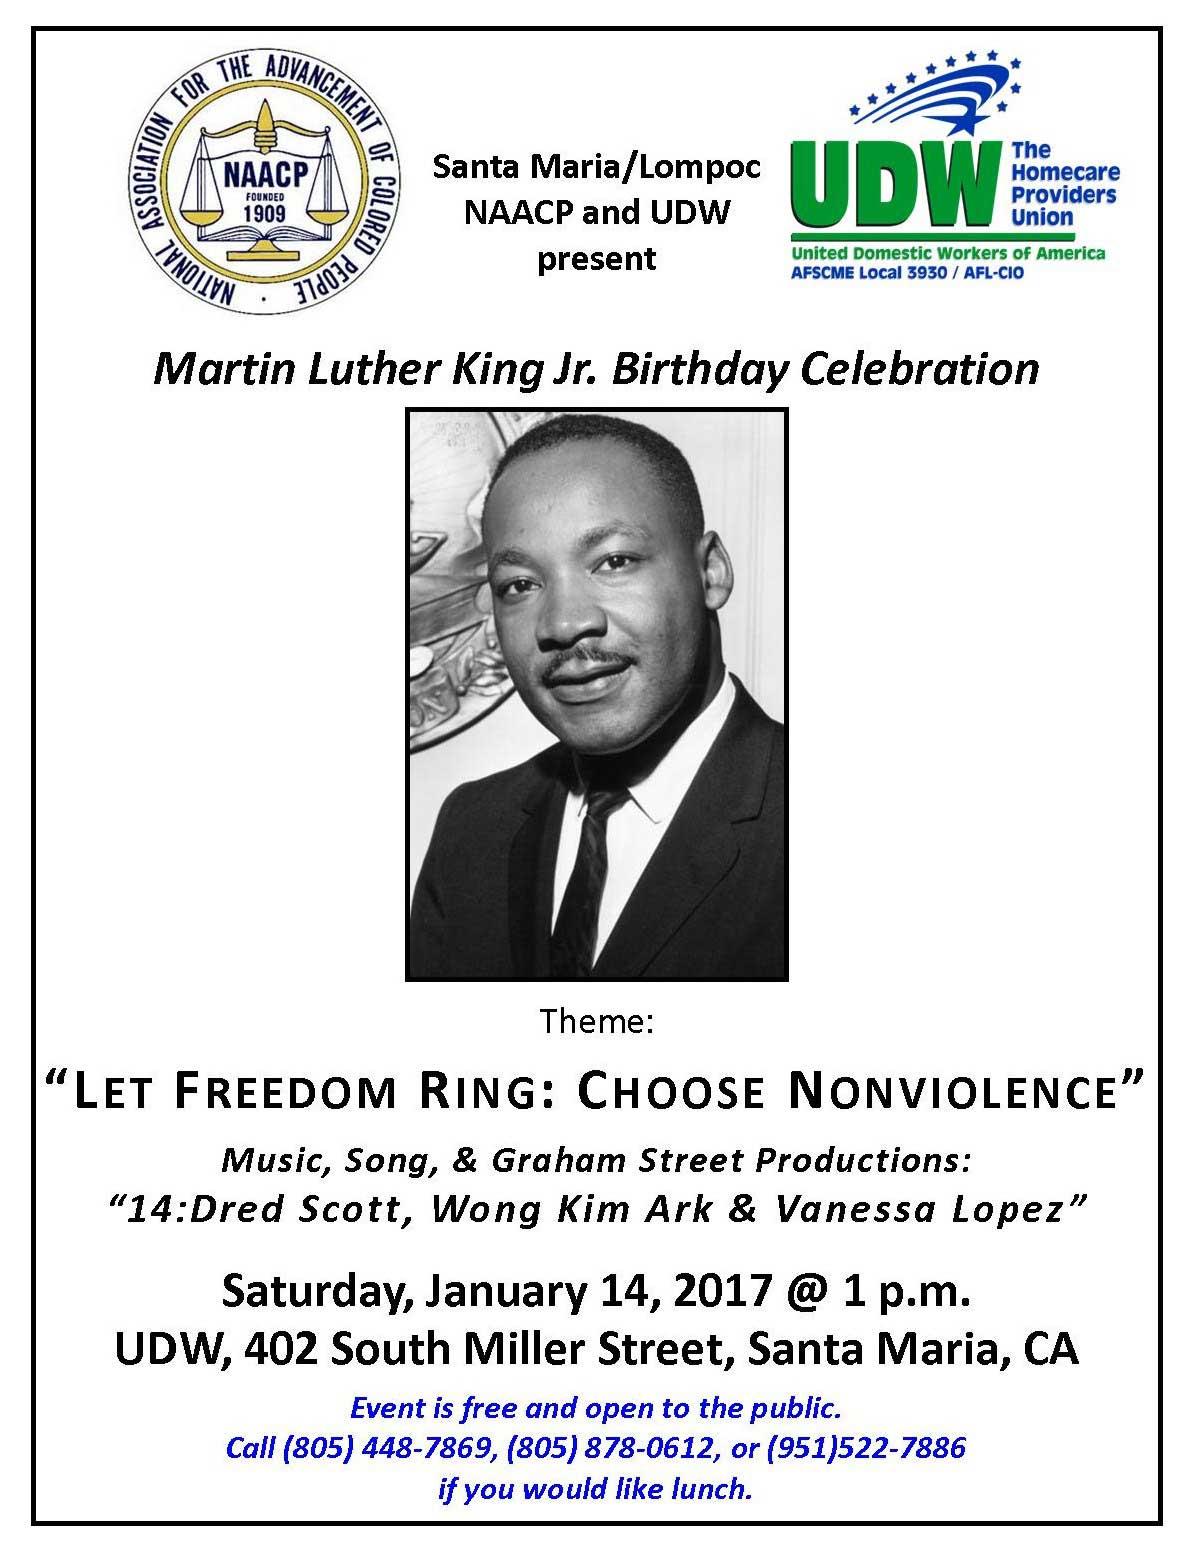 NAACP-UDW-Martin-Luther-King-Jr--Birthday-Celebration-Flyer-2017.jpg